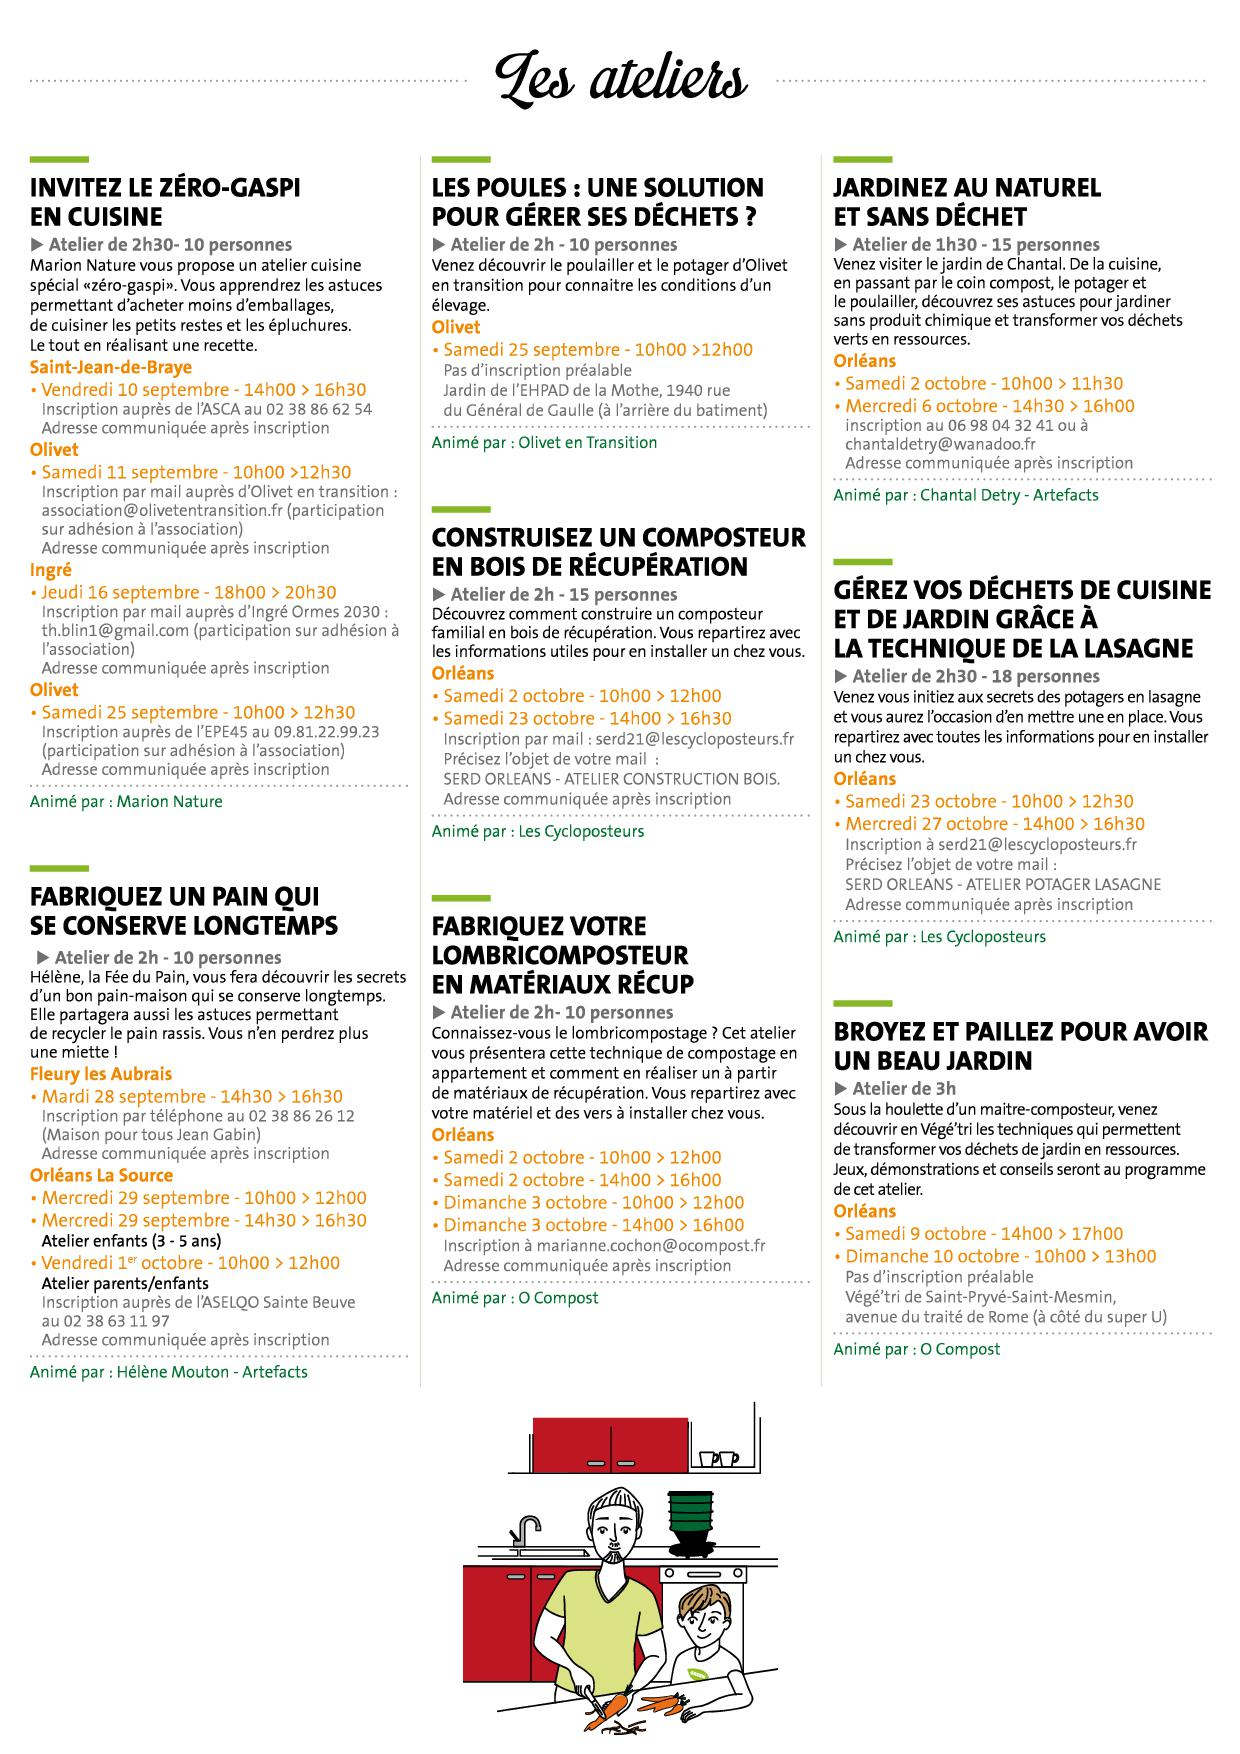 programme_ateliers_0_gaspi-web2.jpg